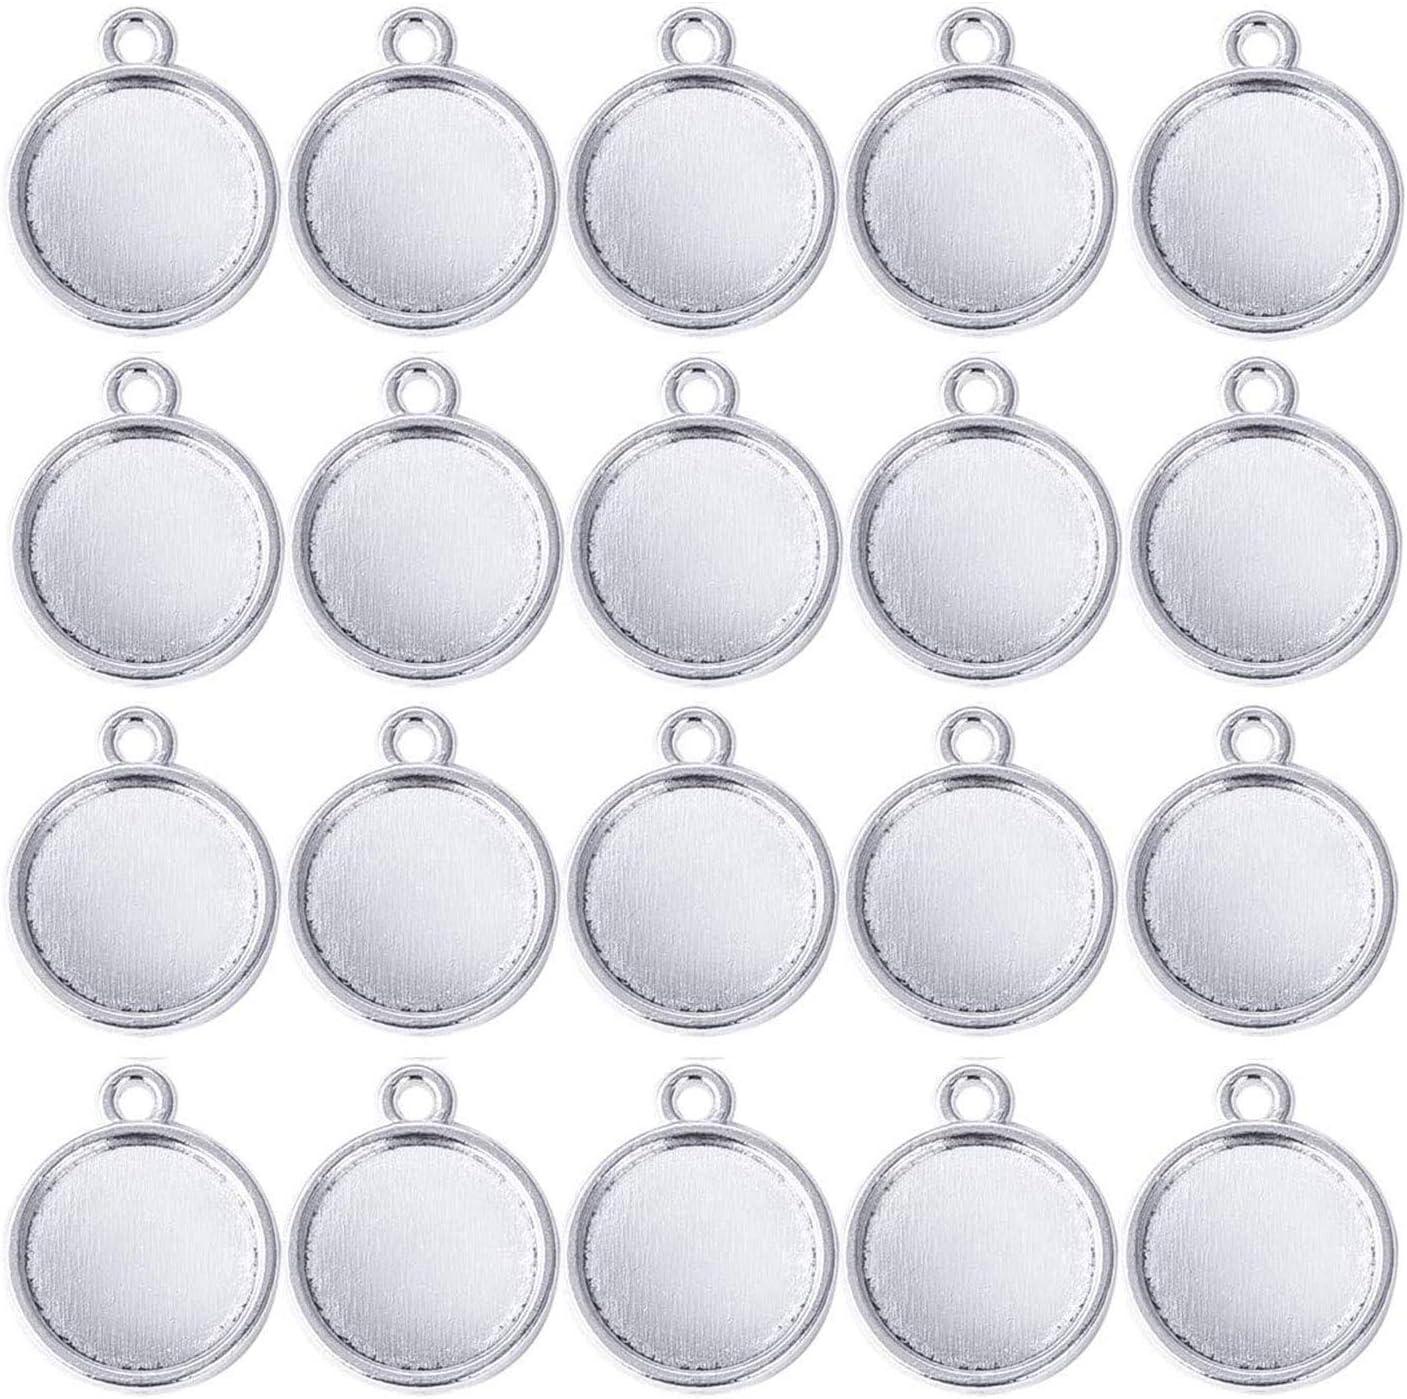 25x18mm blank G10141 Raw Brass Pendant Blank Mosaic Base Blank inlay Blank Necklace Blank Resin Blank Mountings Cabochon Bezel Base